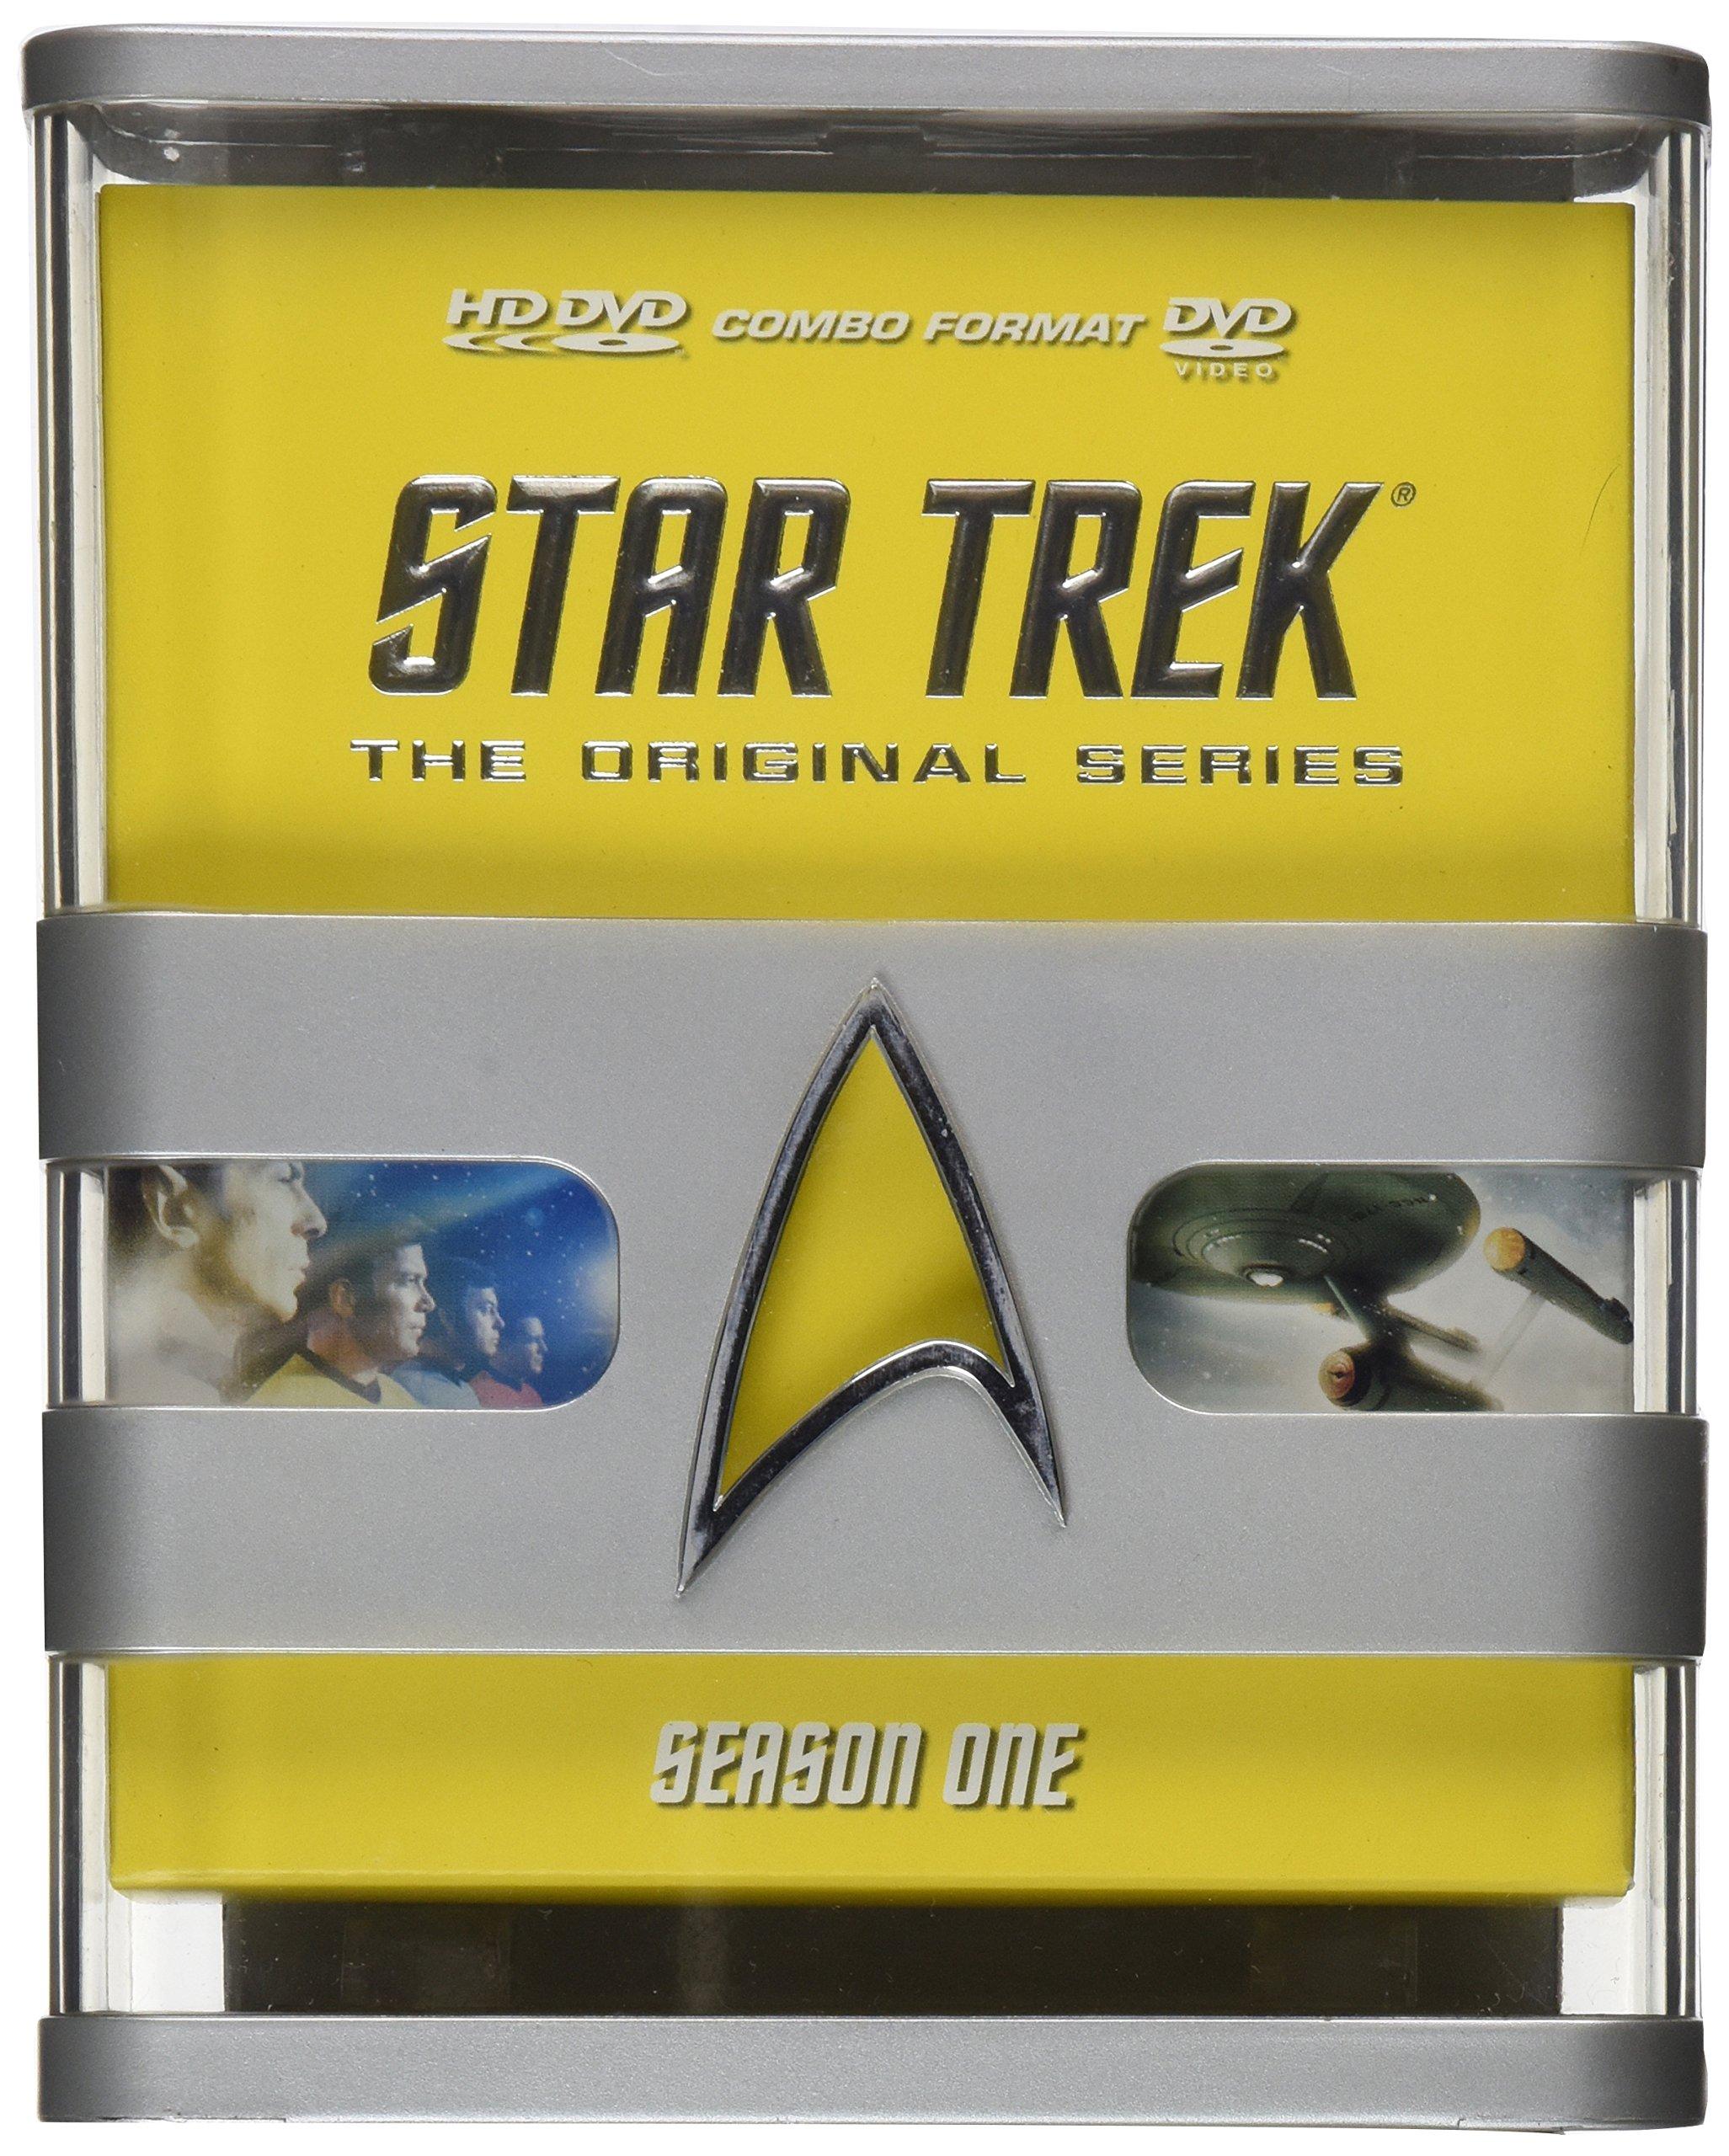 Star Trek: The Original Series - Season 1 on HD-DVD (digitally remastered) by